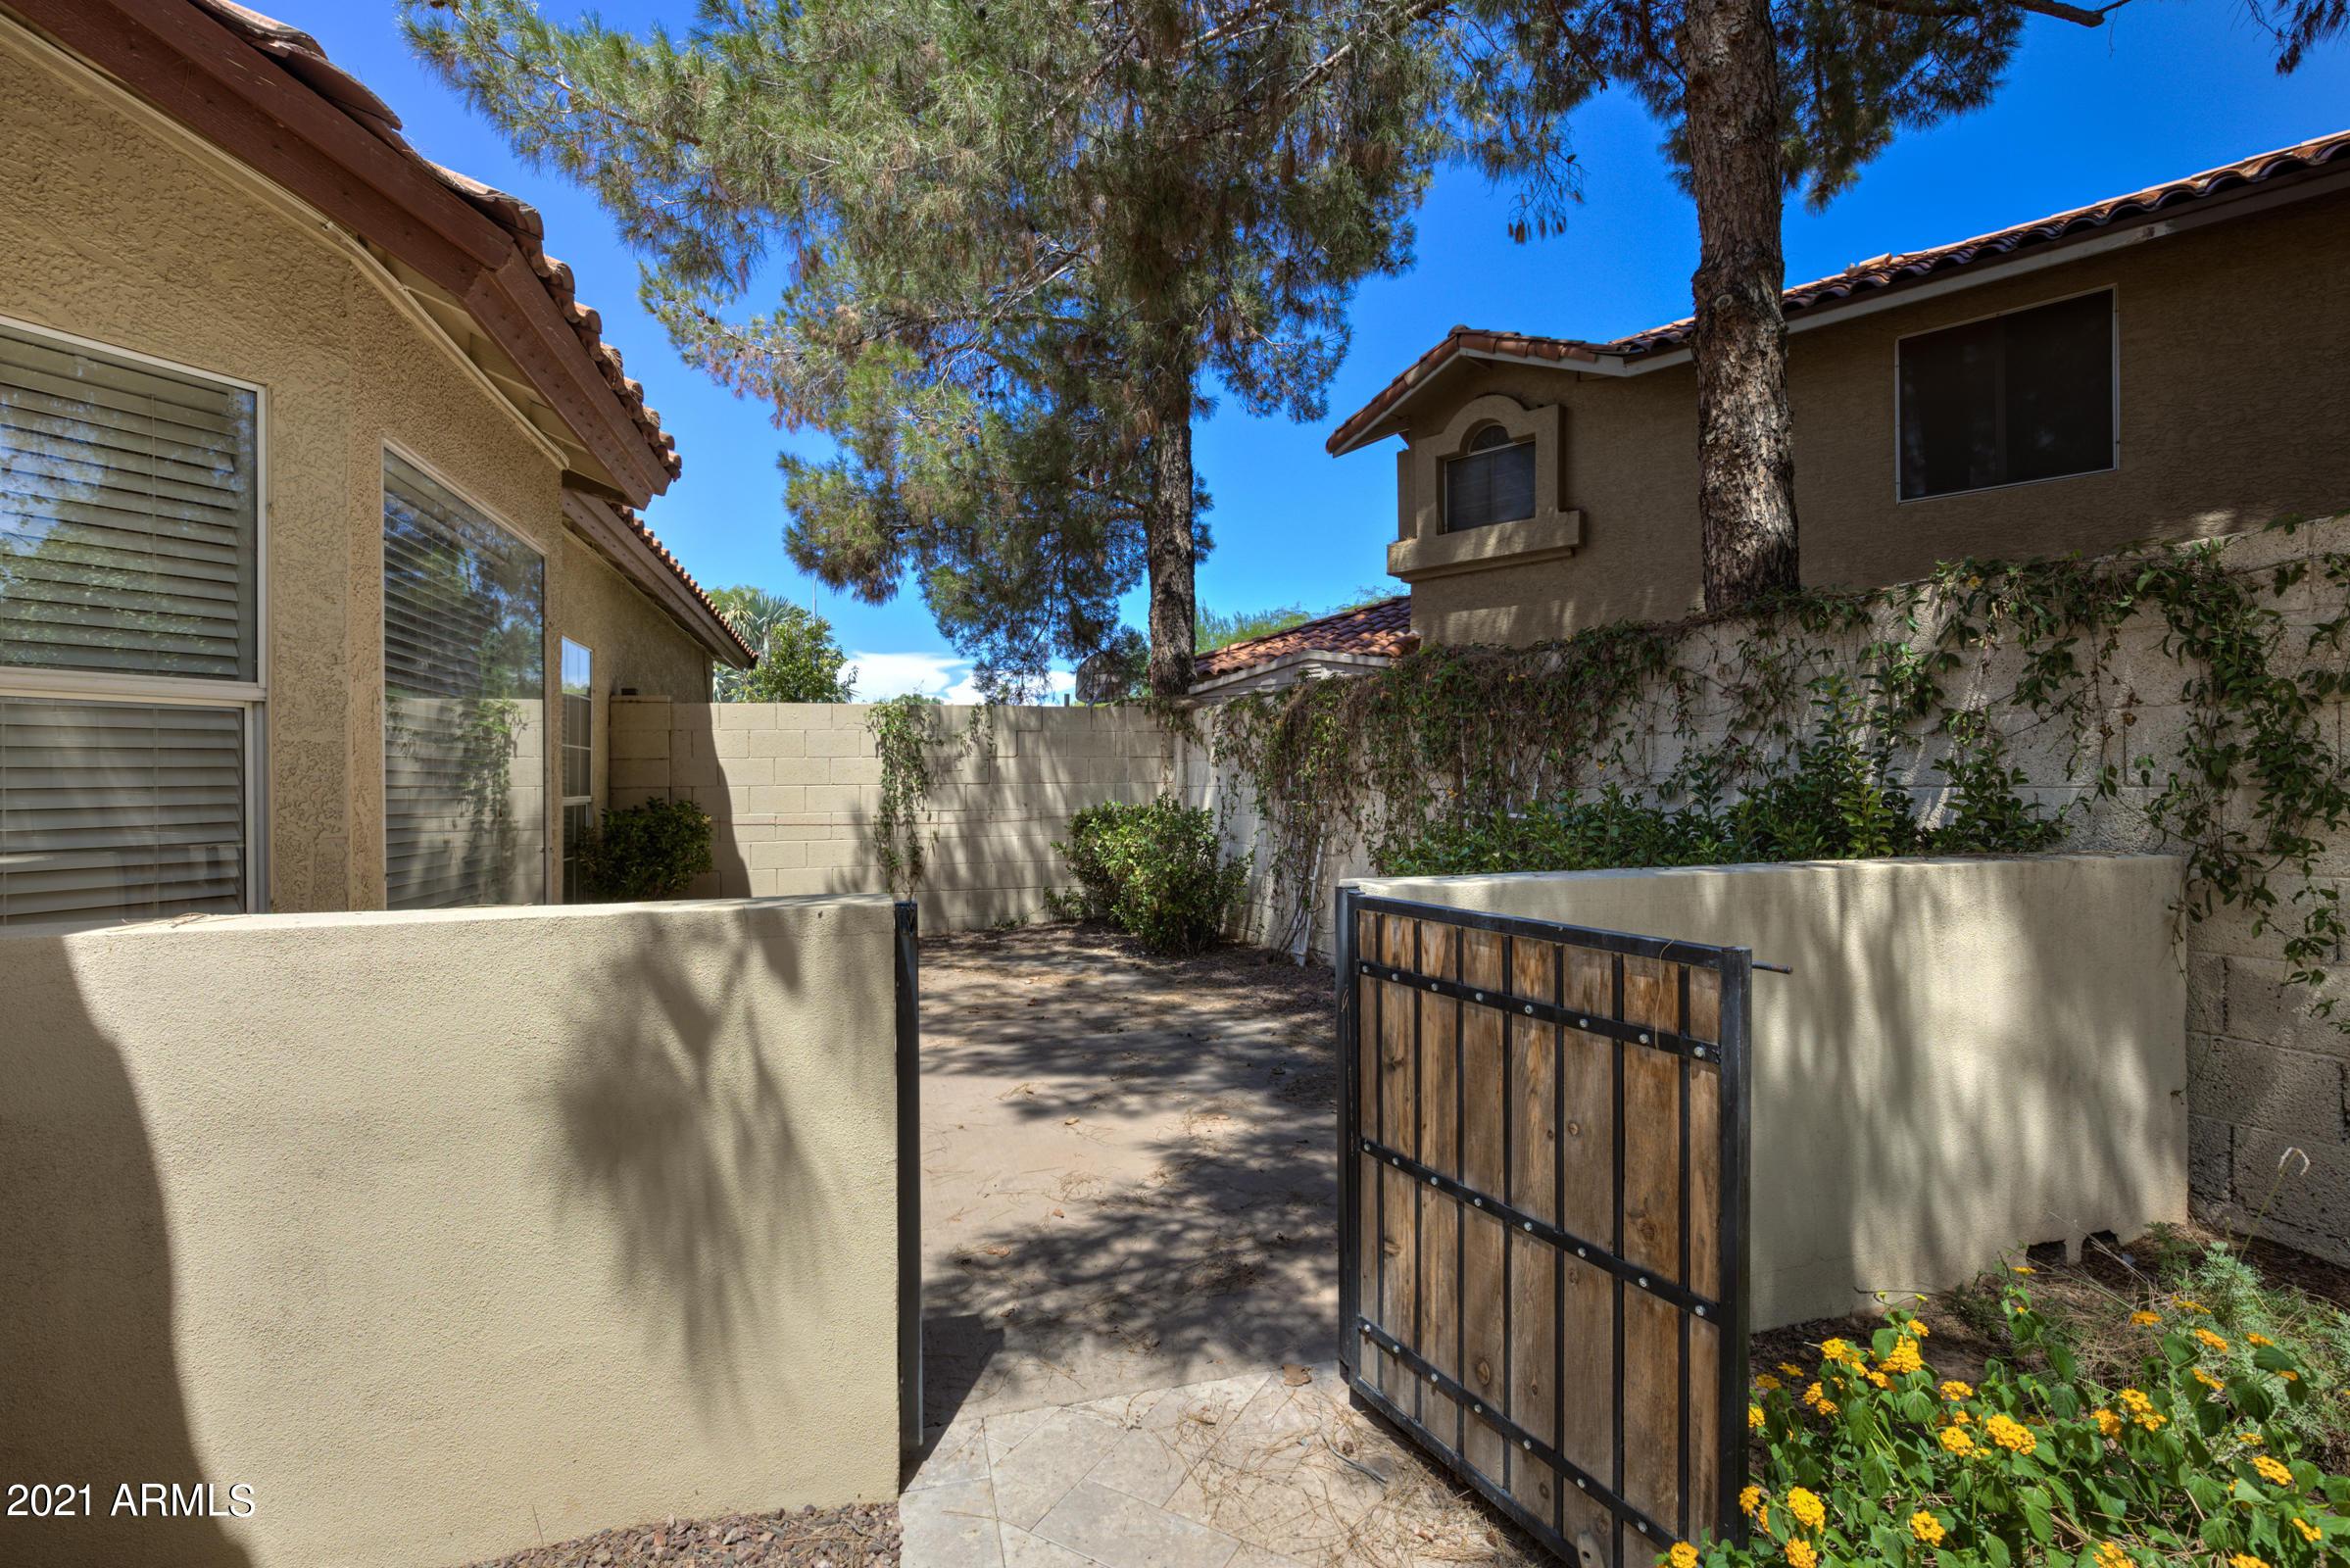 MLS 6272314 1711 W MONTEREY Street, Chandler, AZ 85224 Chandler AZ North Chandler